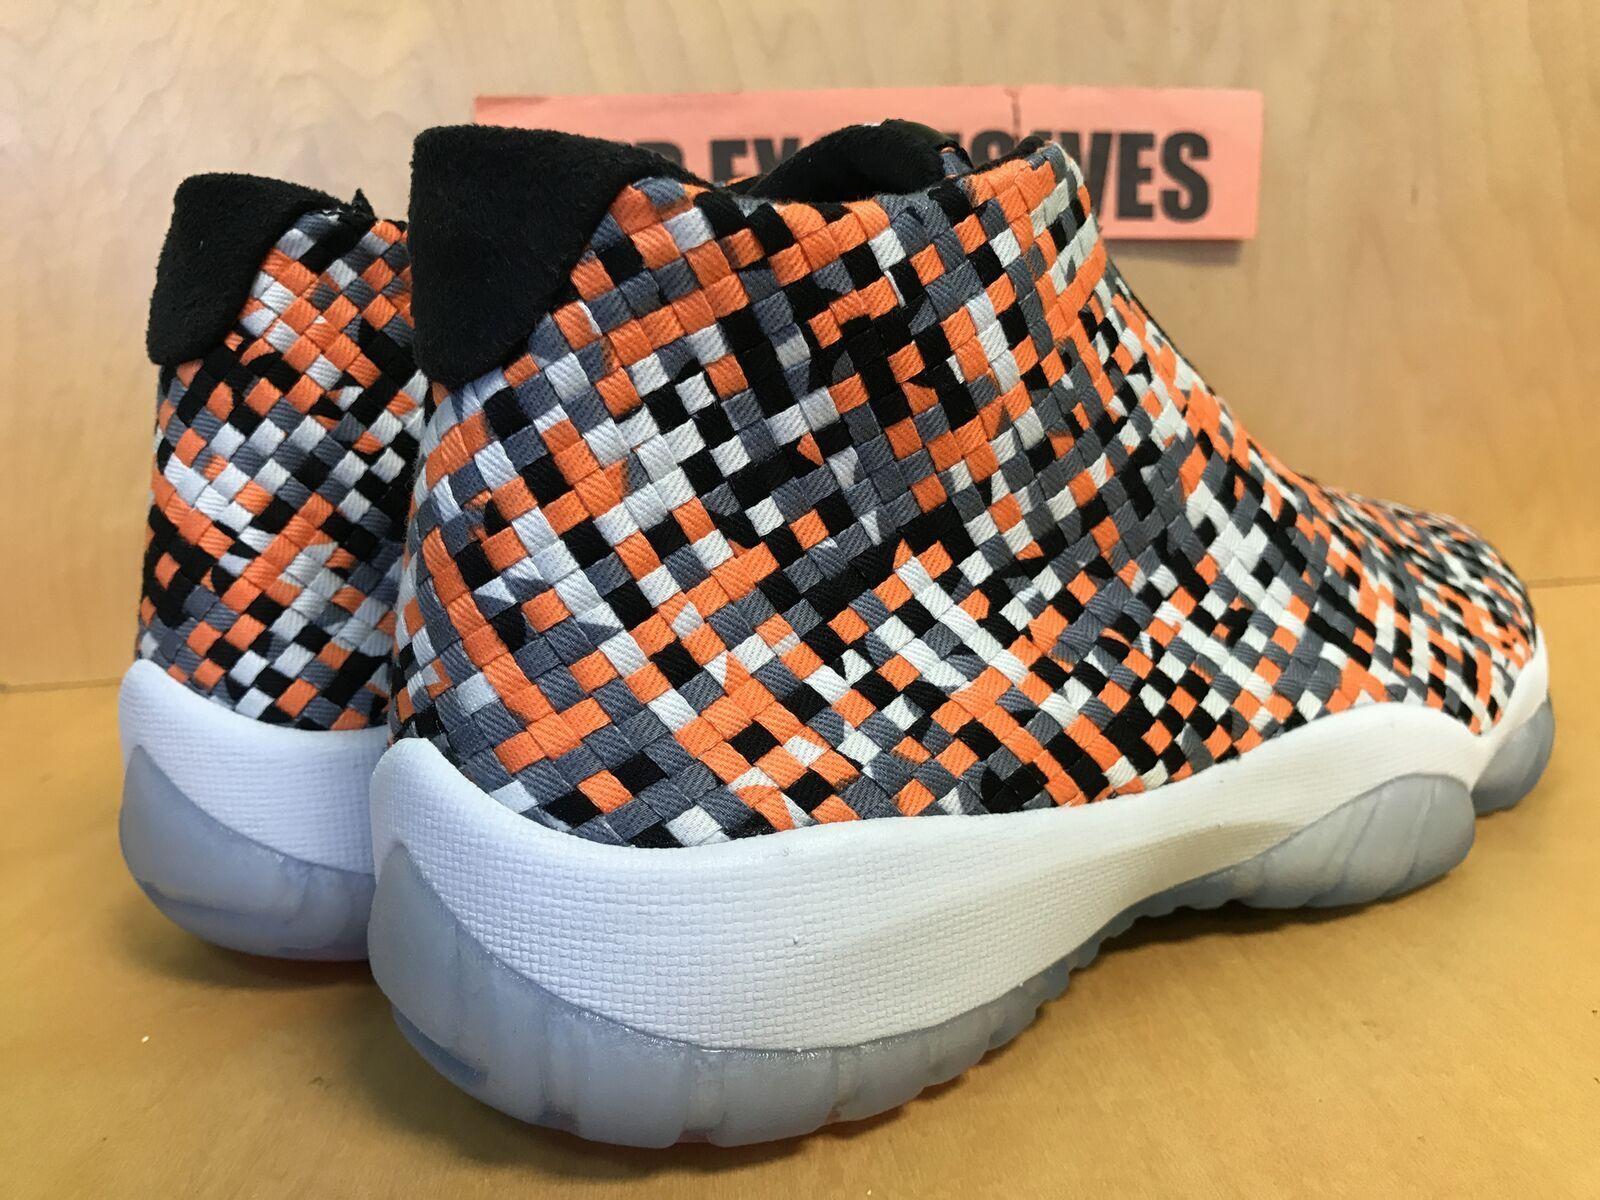 Nike air jordan zukunft premium - ostern ostern ostern 652141-006 10 multi - farbe d4edba